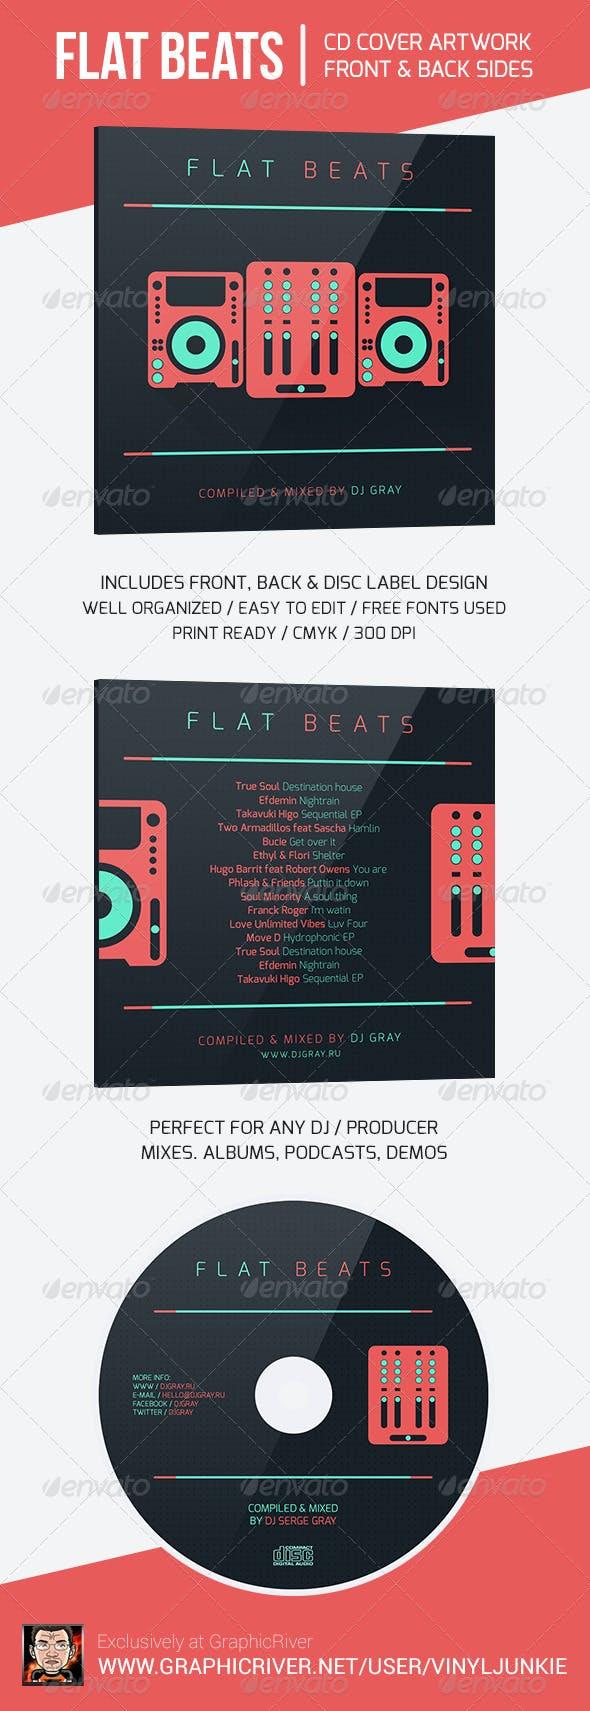 flat beats dj mix cd cover artwork template by vinyljunkie